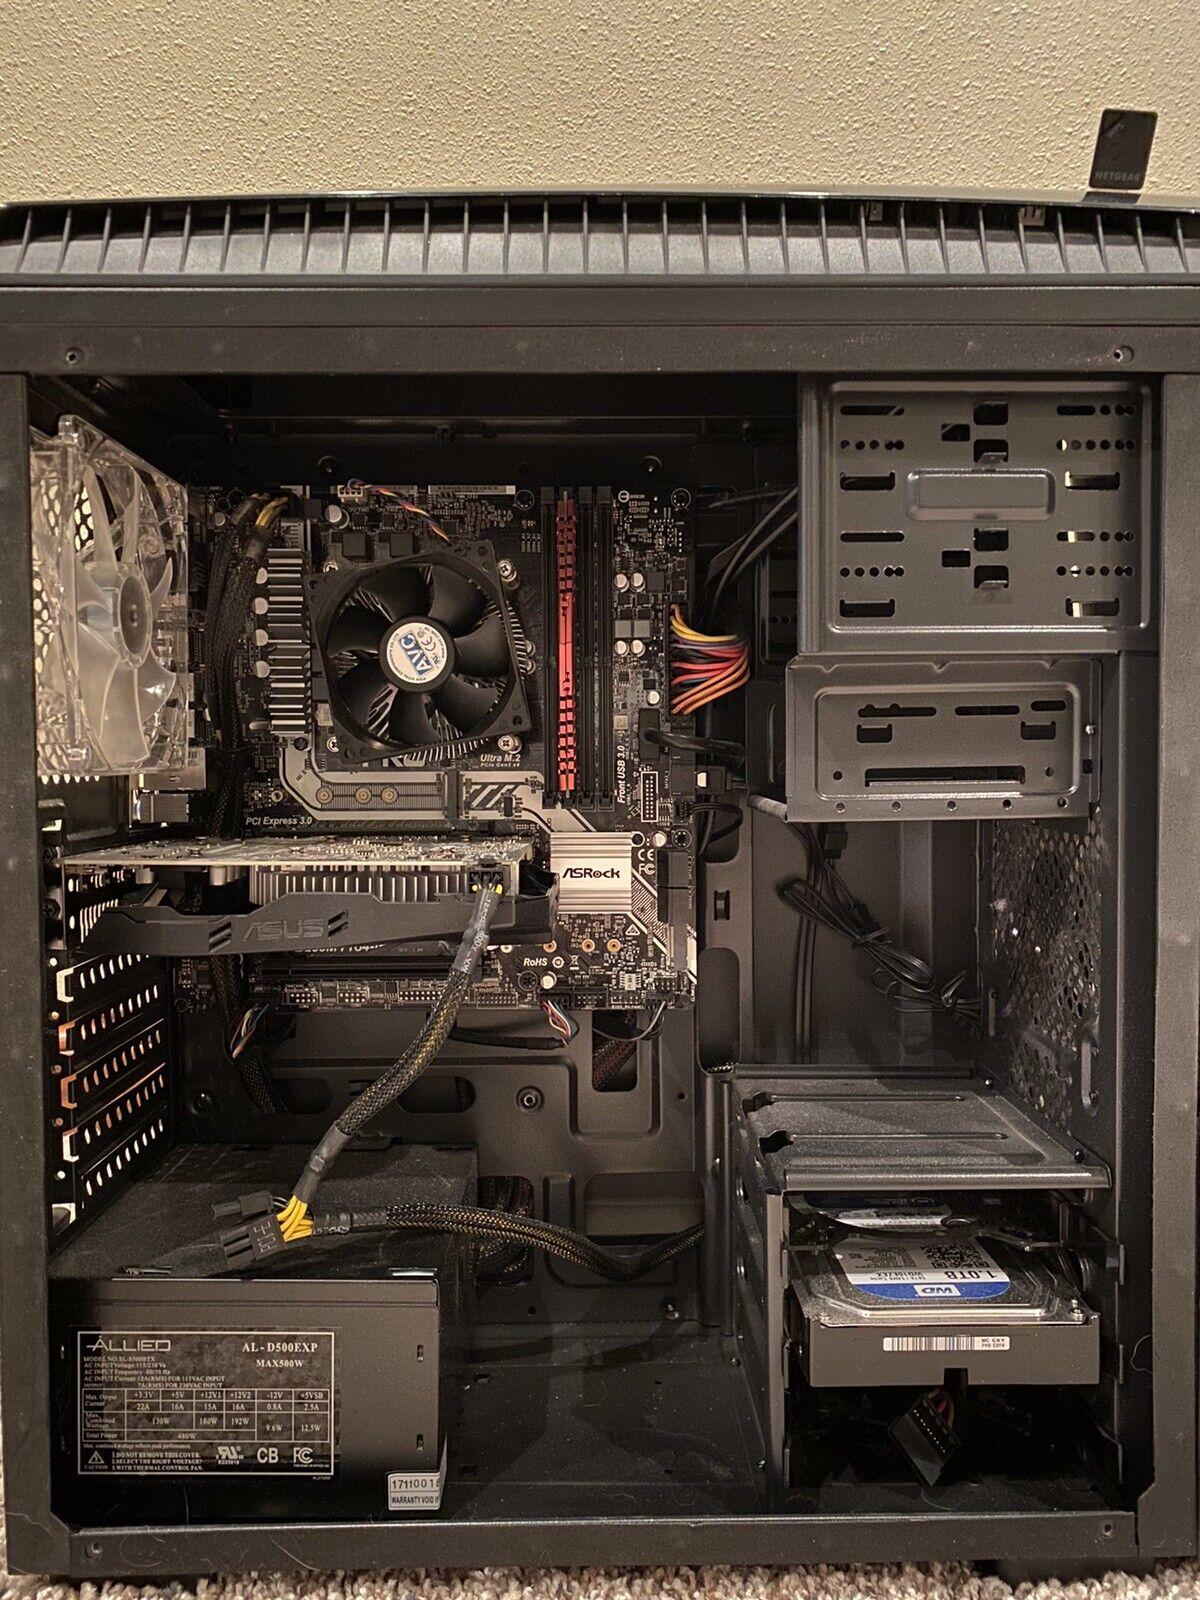 Gaming Pc Intel i7 7700 cpu 3.60GHz 8gb of ram1TB of memory GeForce GTX 1060 3GB